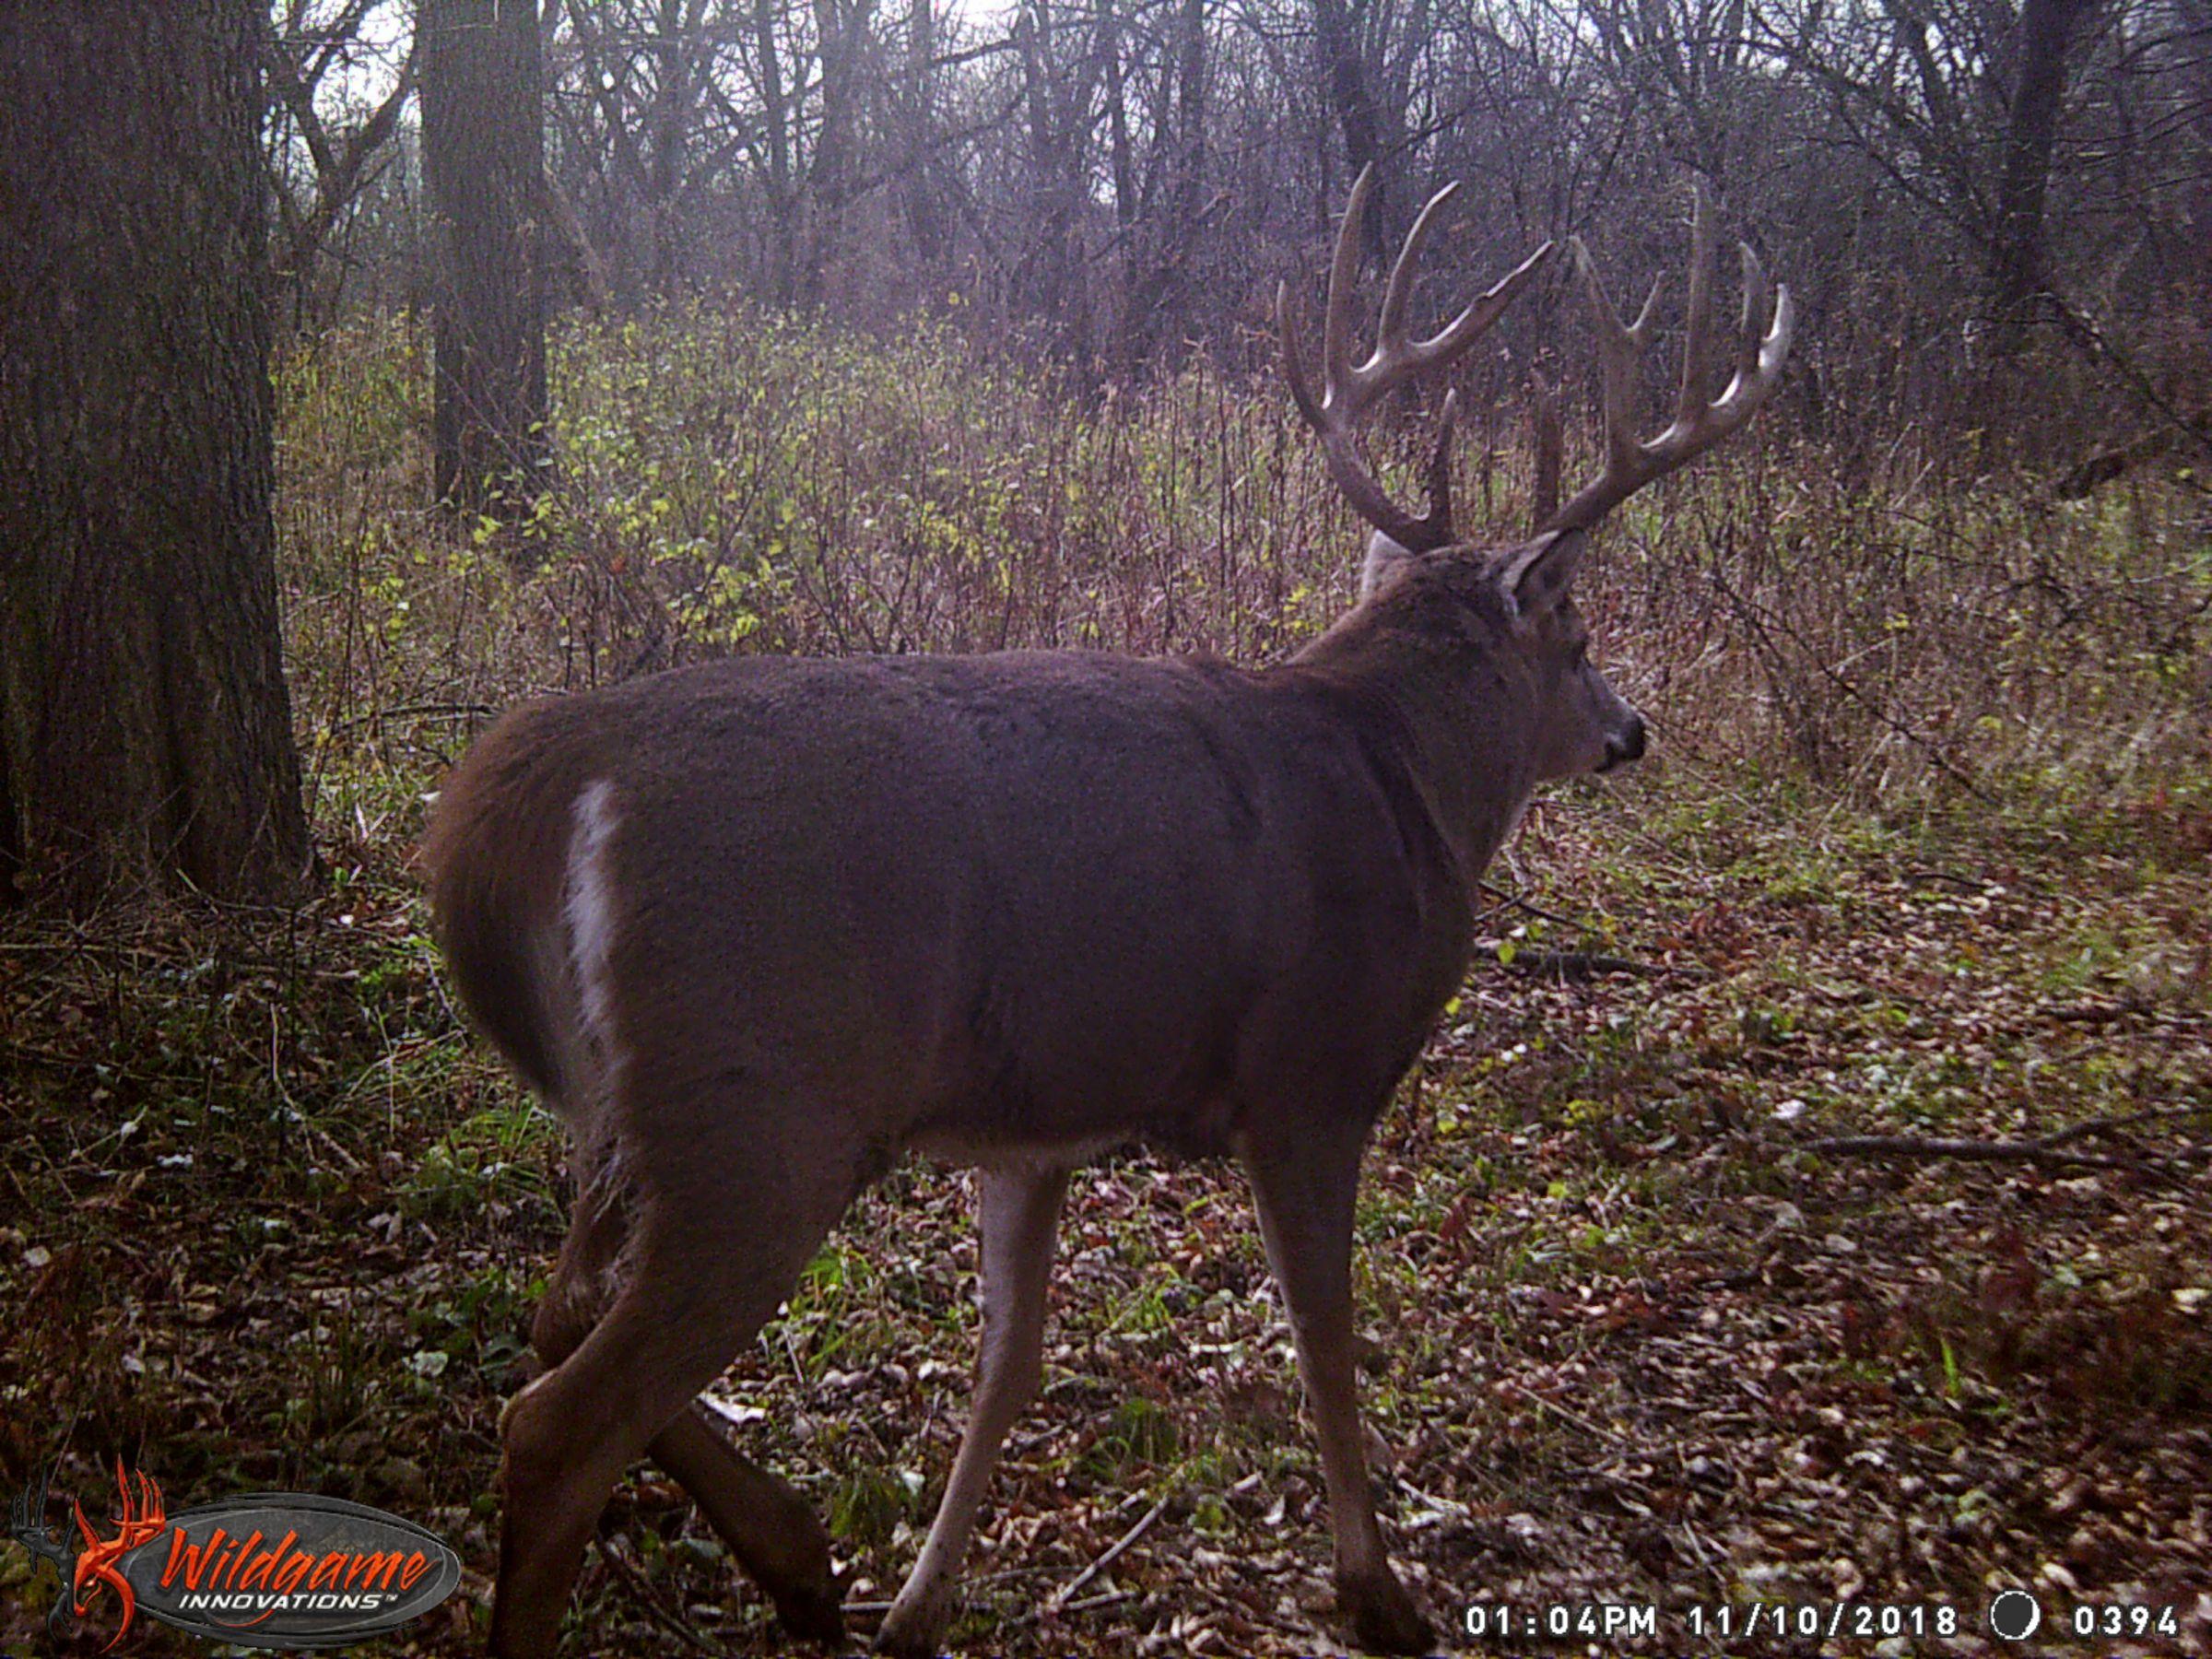 land-clarke-county-iowa-325-acres-listing-number-15416-7-2021-03-19-165616.JPG